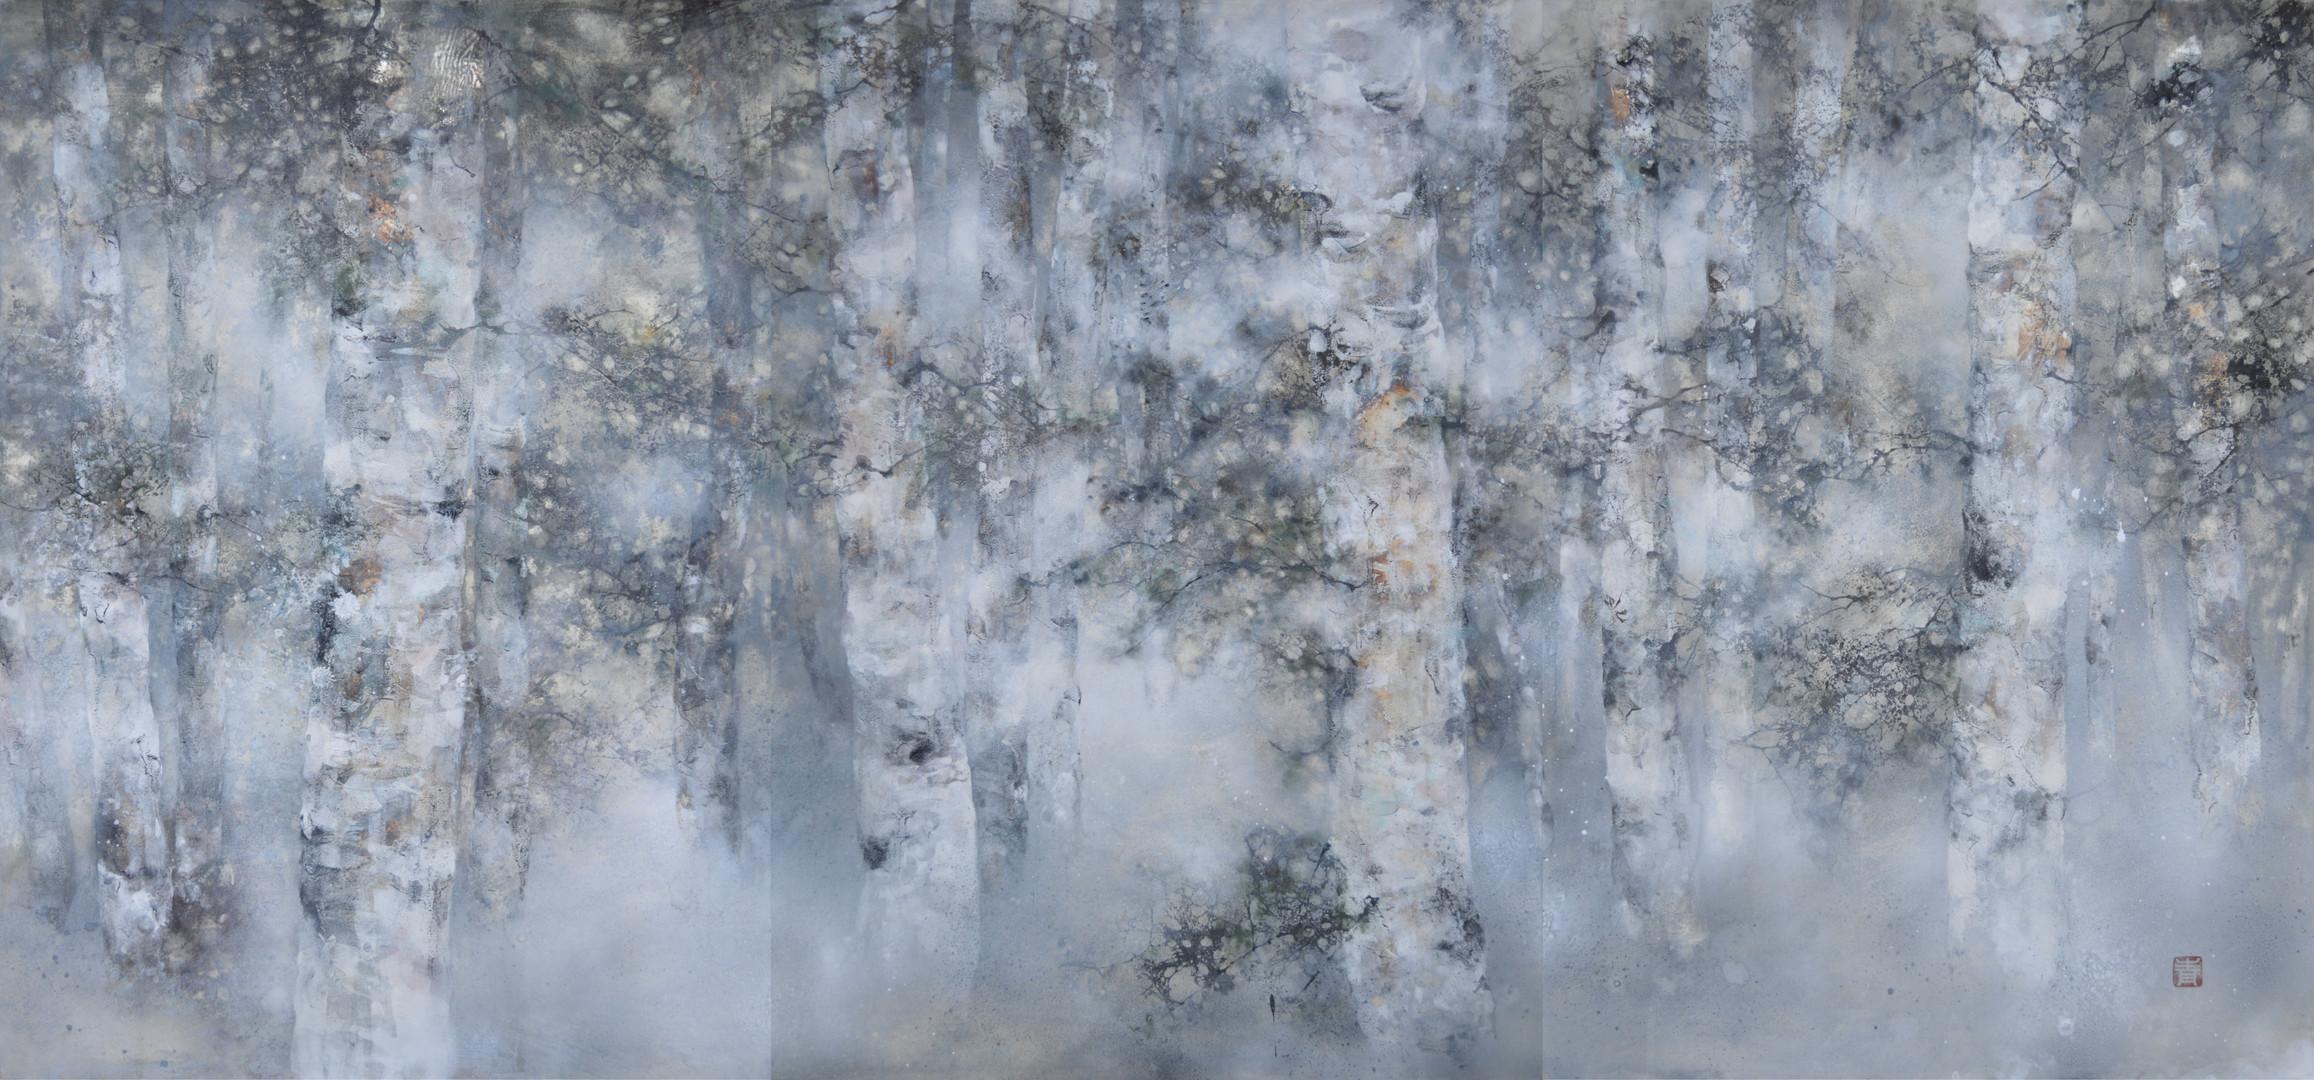 Plénitude - 100 x 210 cm / 2019